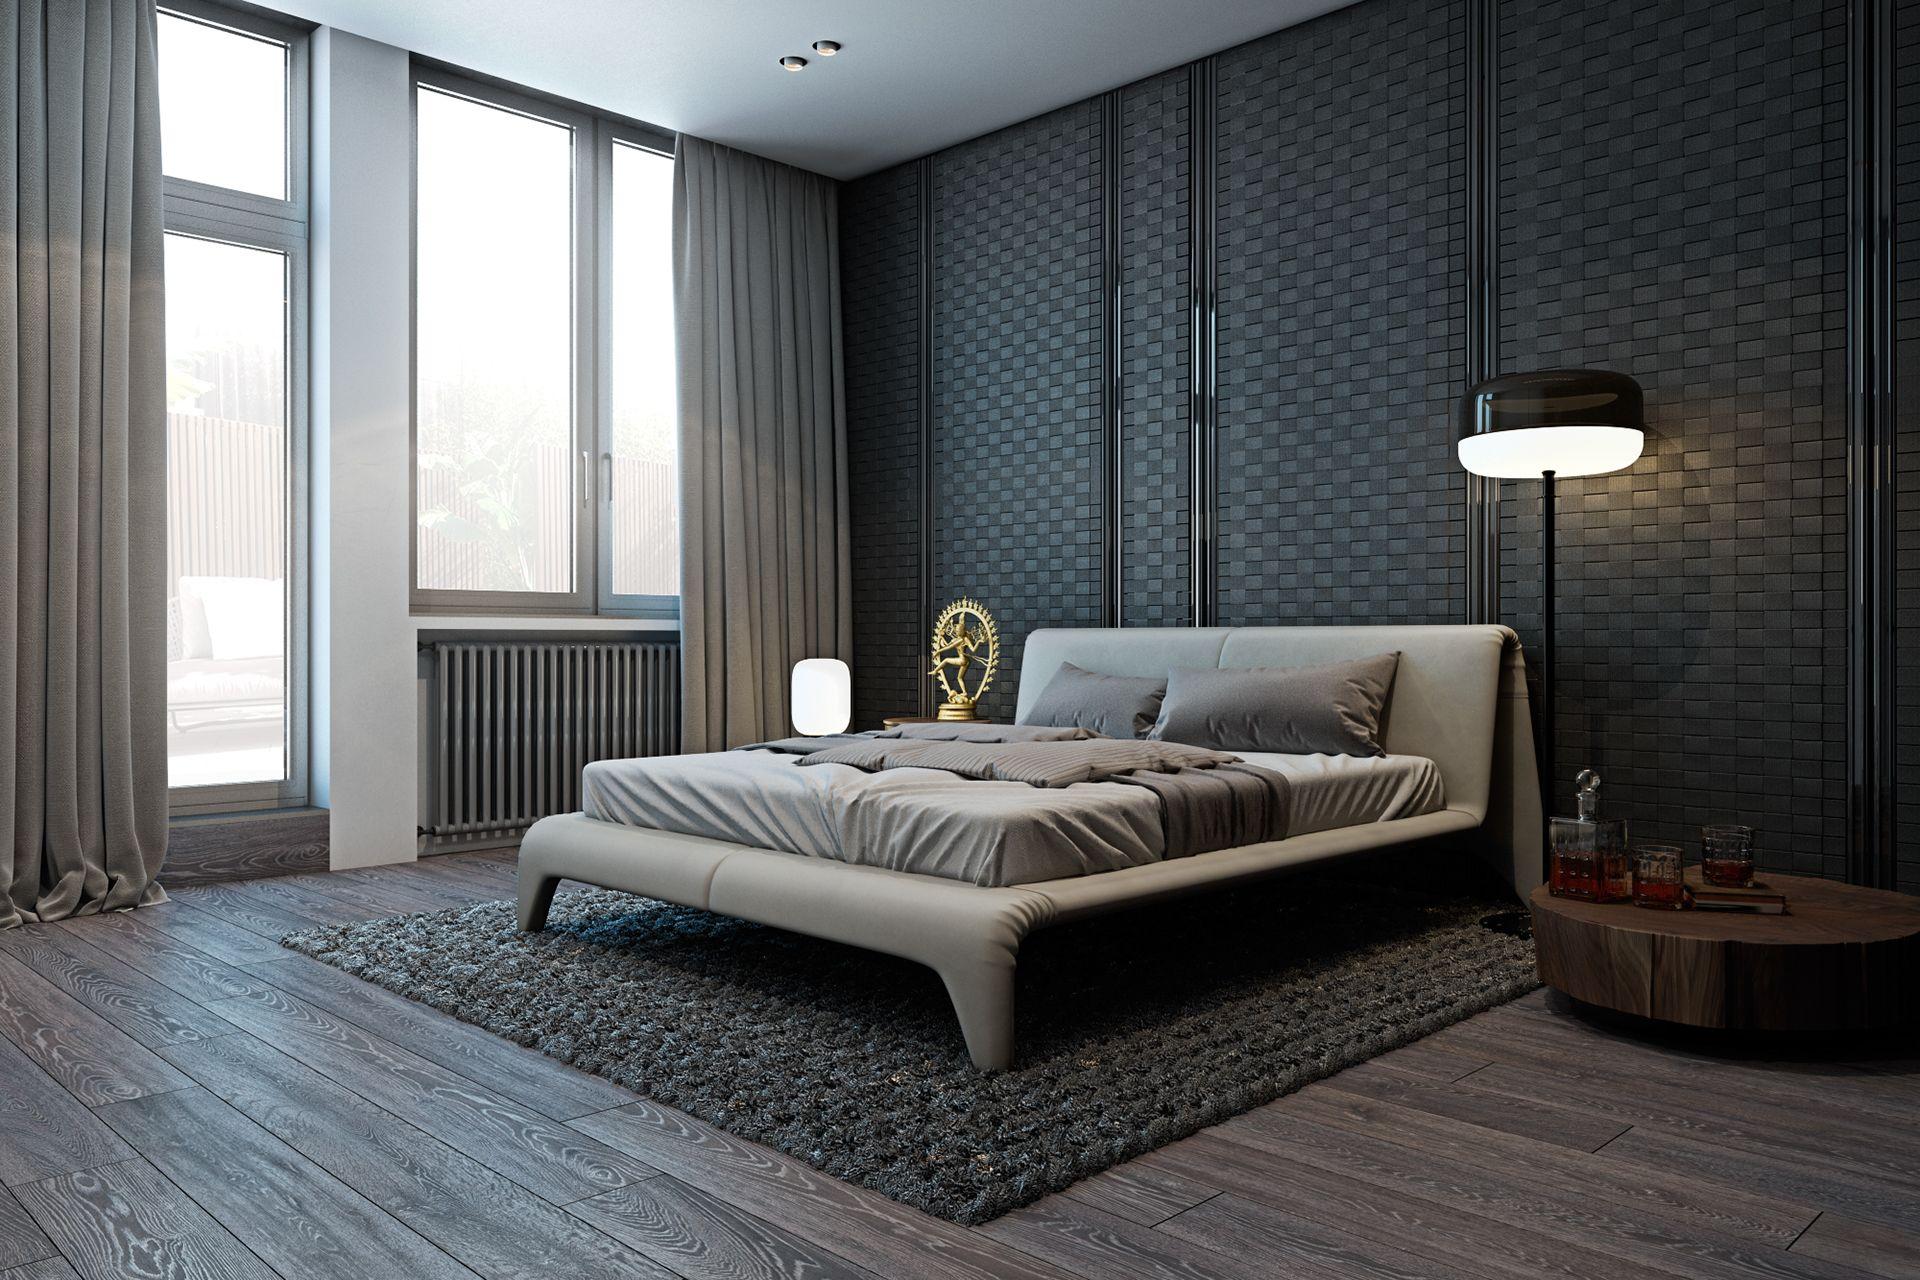 Modernes Polsterbett In Grau Und Wandverkleidung Mit Metall Struktur    Bedroom Design   Pinterest   Bedrooms And Interiors